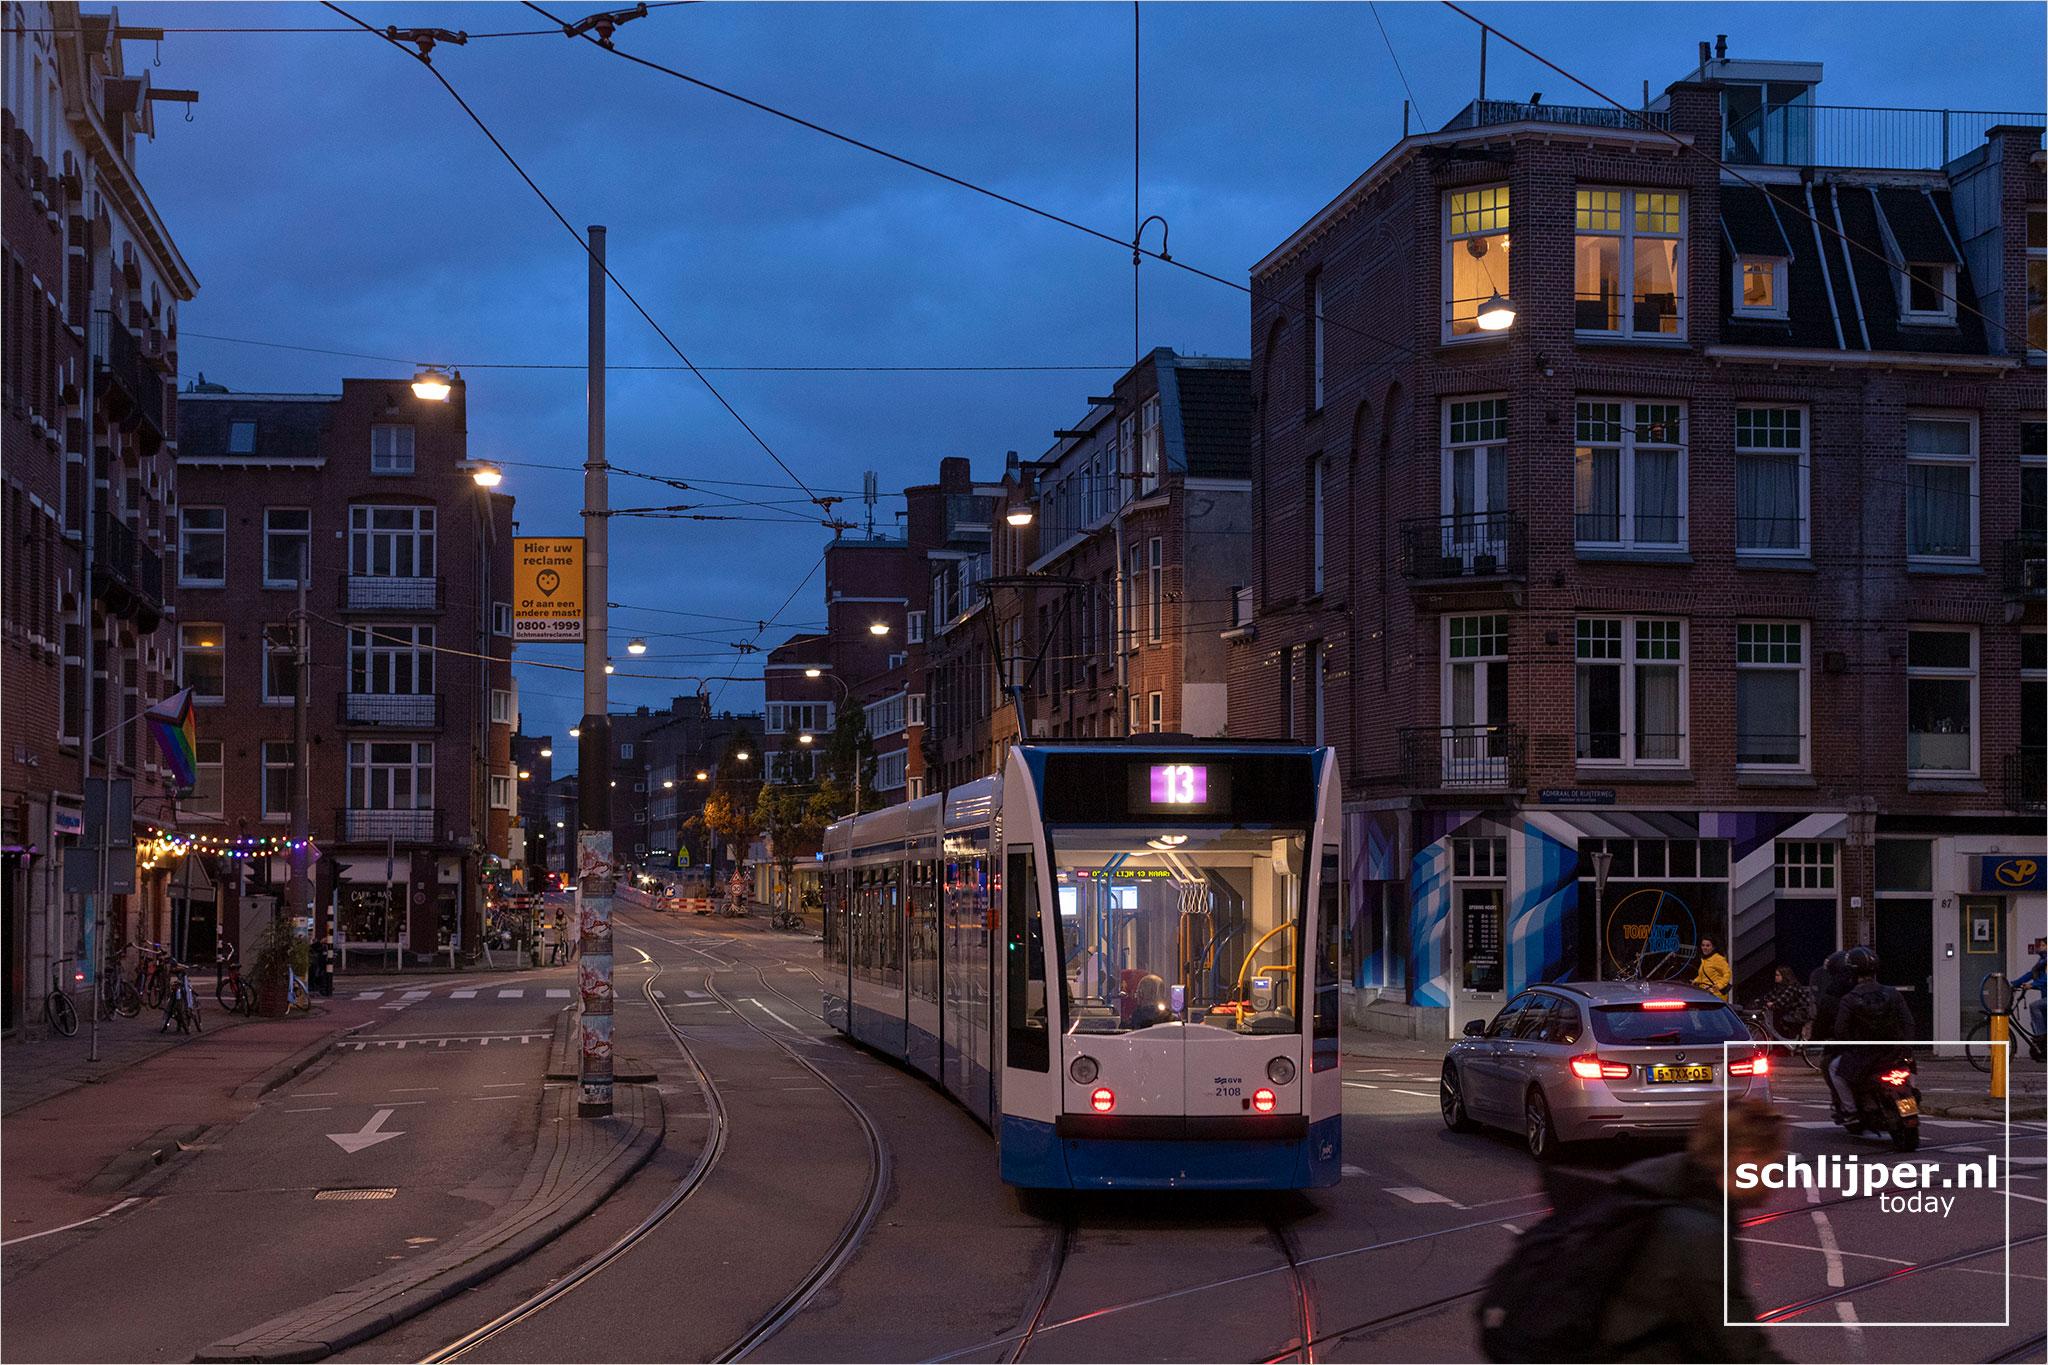 The Netherlands, Amsterdam, 11 n oktober 2021